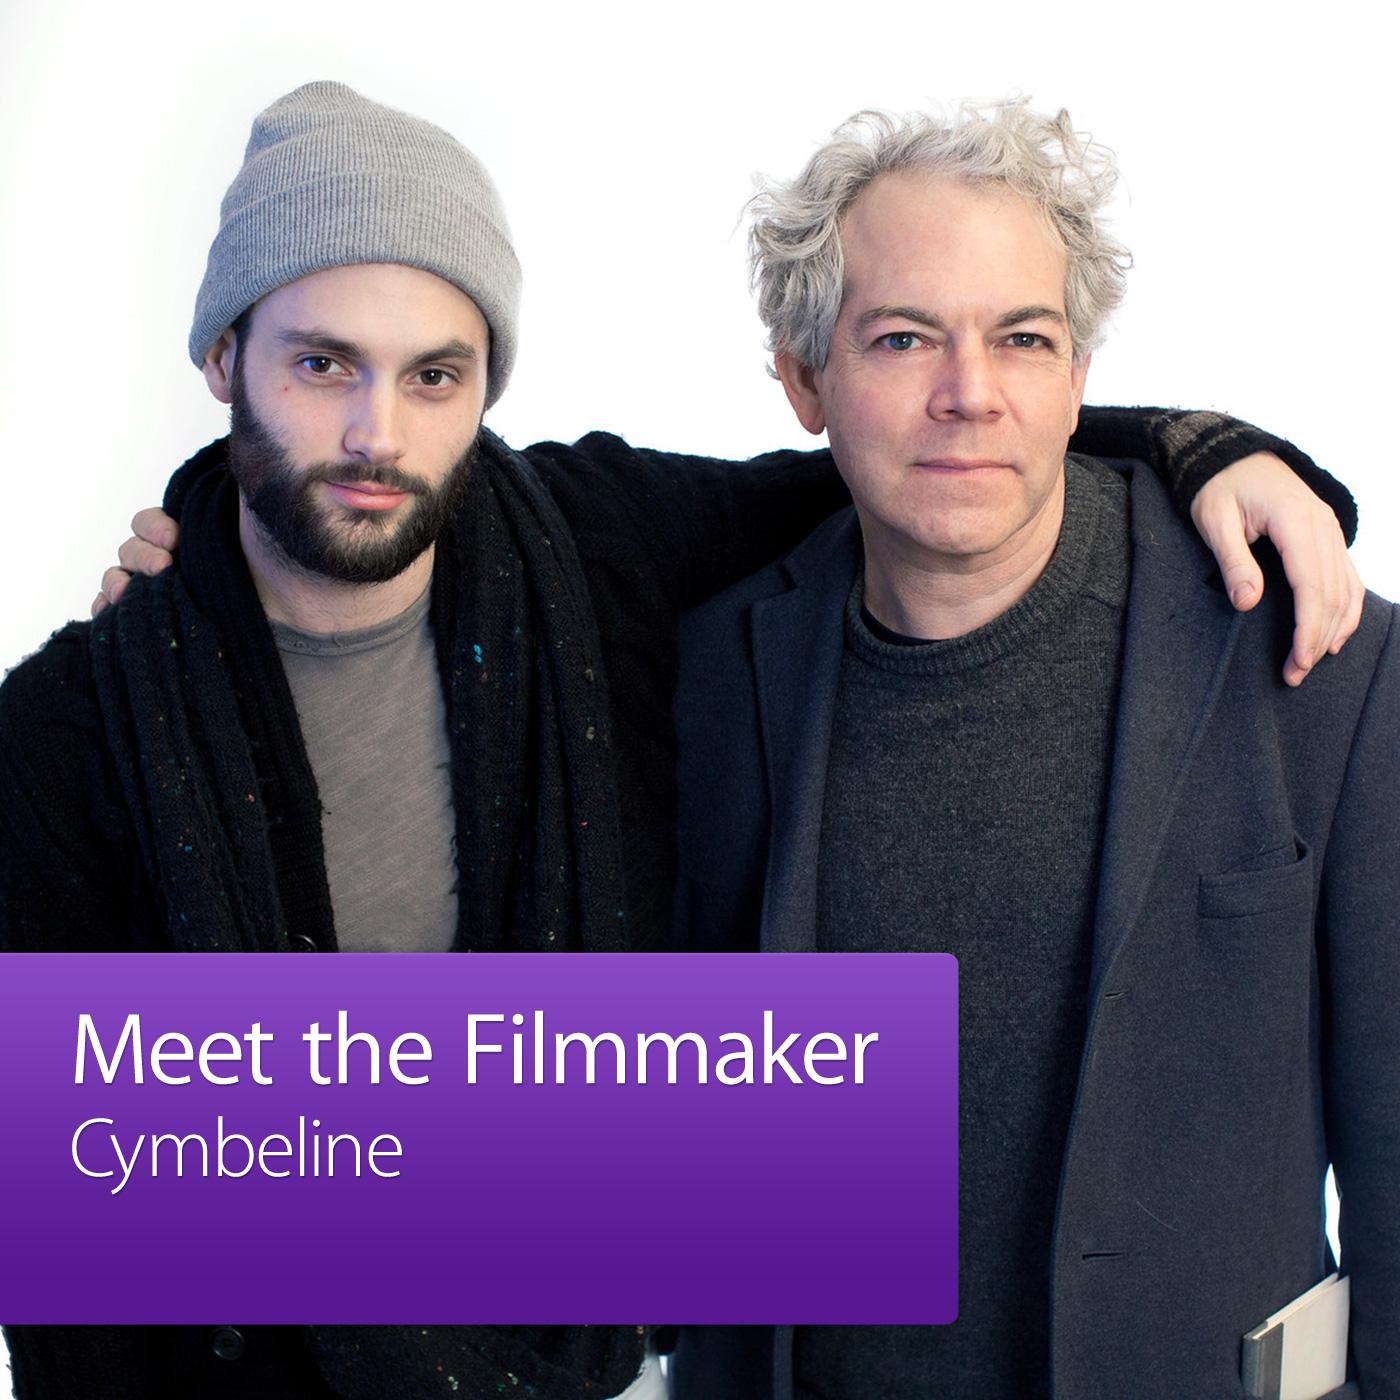 Cymbeline: Meet The Filmmaker